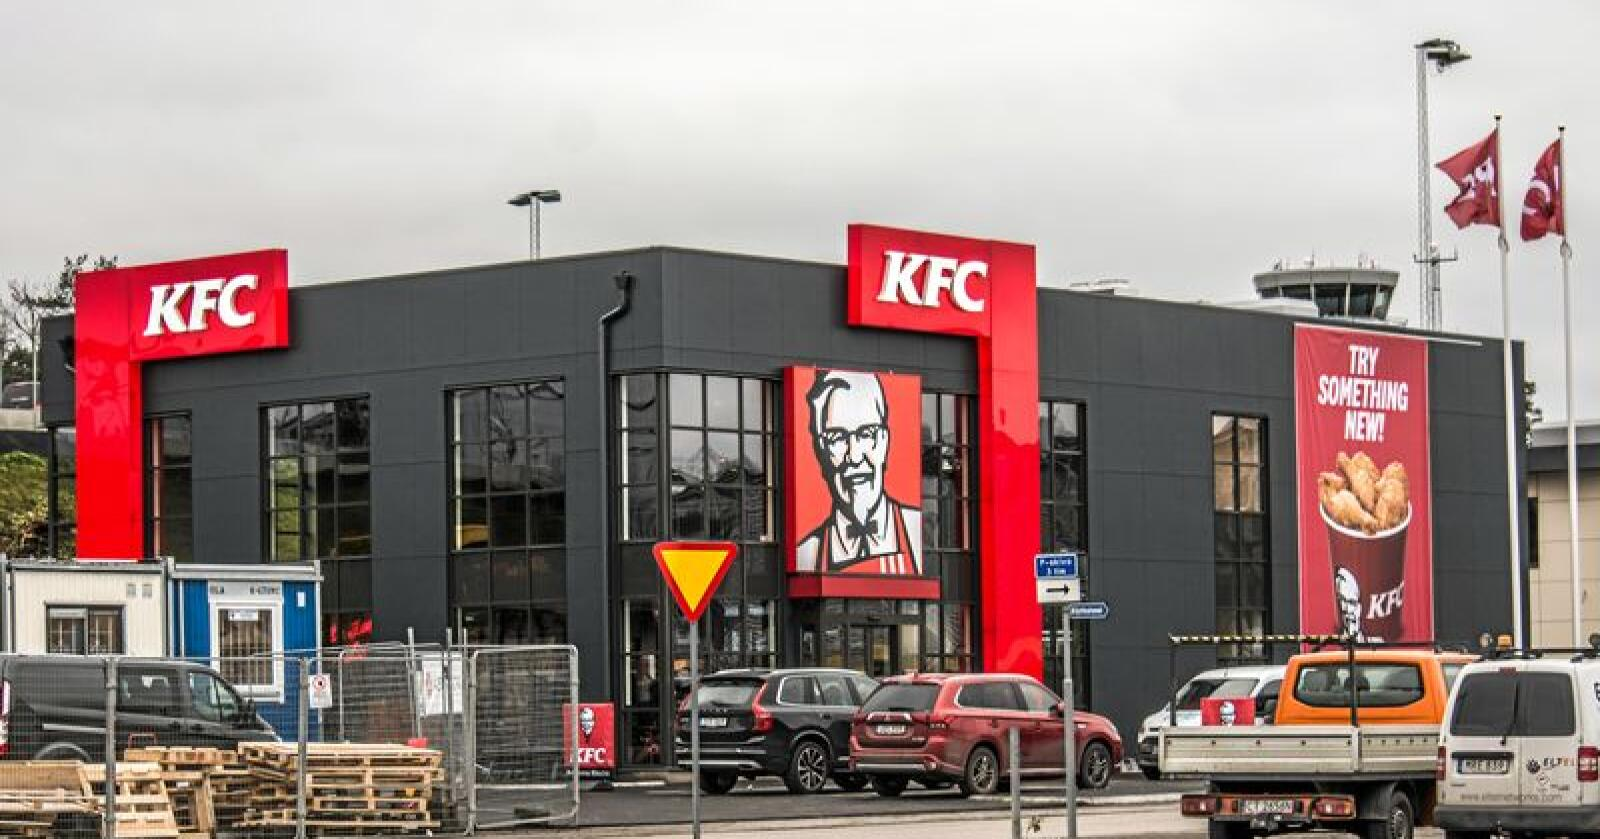 Japanarane flokkar til KFC i jola. Foto: Mostphotos